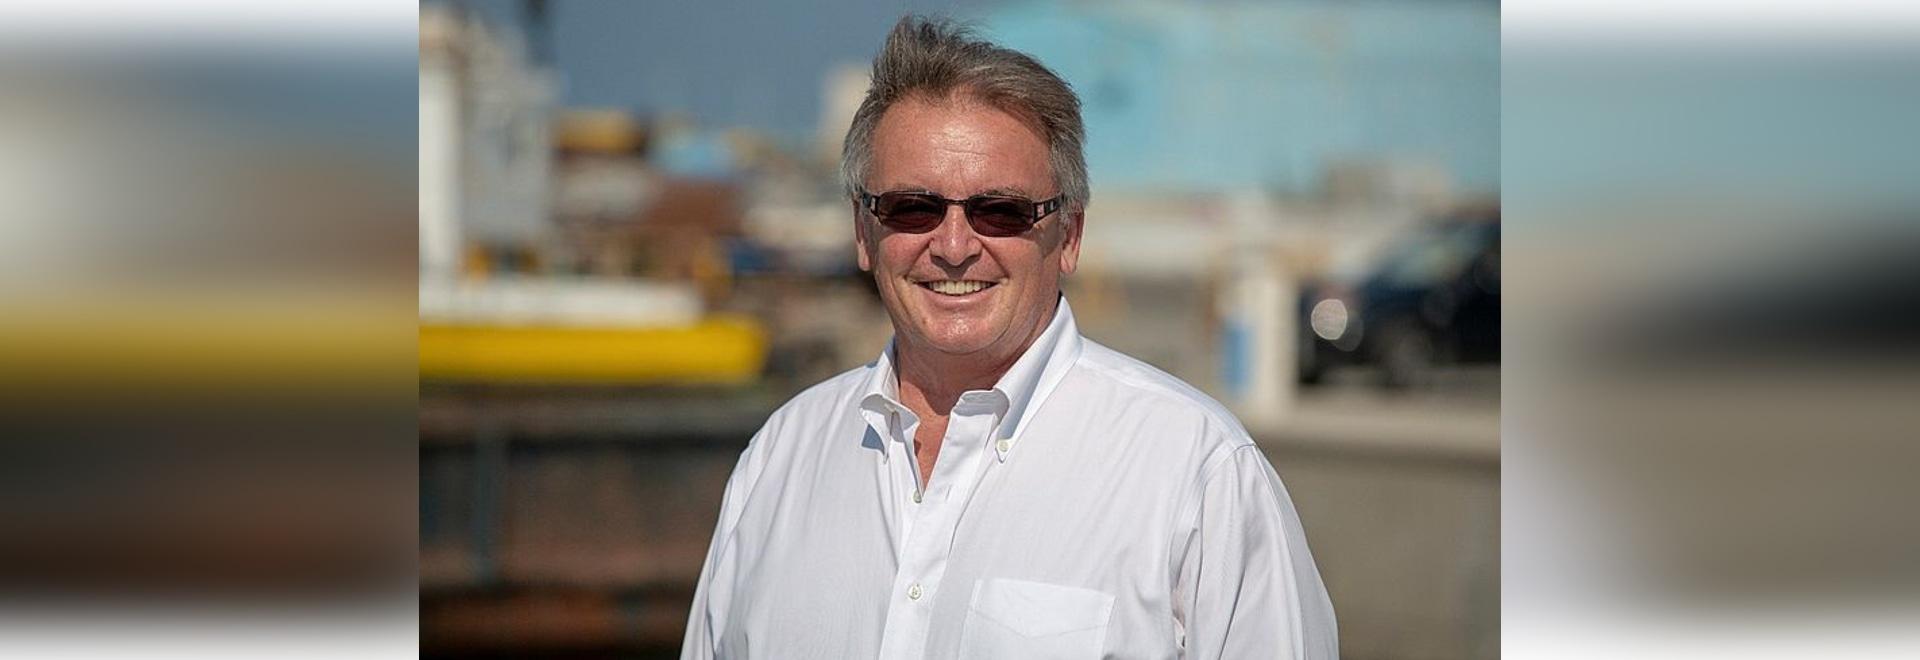 YPI kündigt Peter Thompson als neuen geschäftsführenden Gesellschafter, Yacht Sales, an